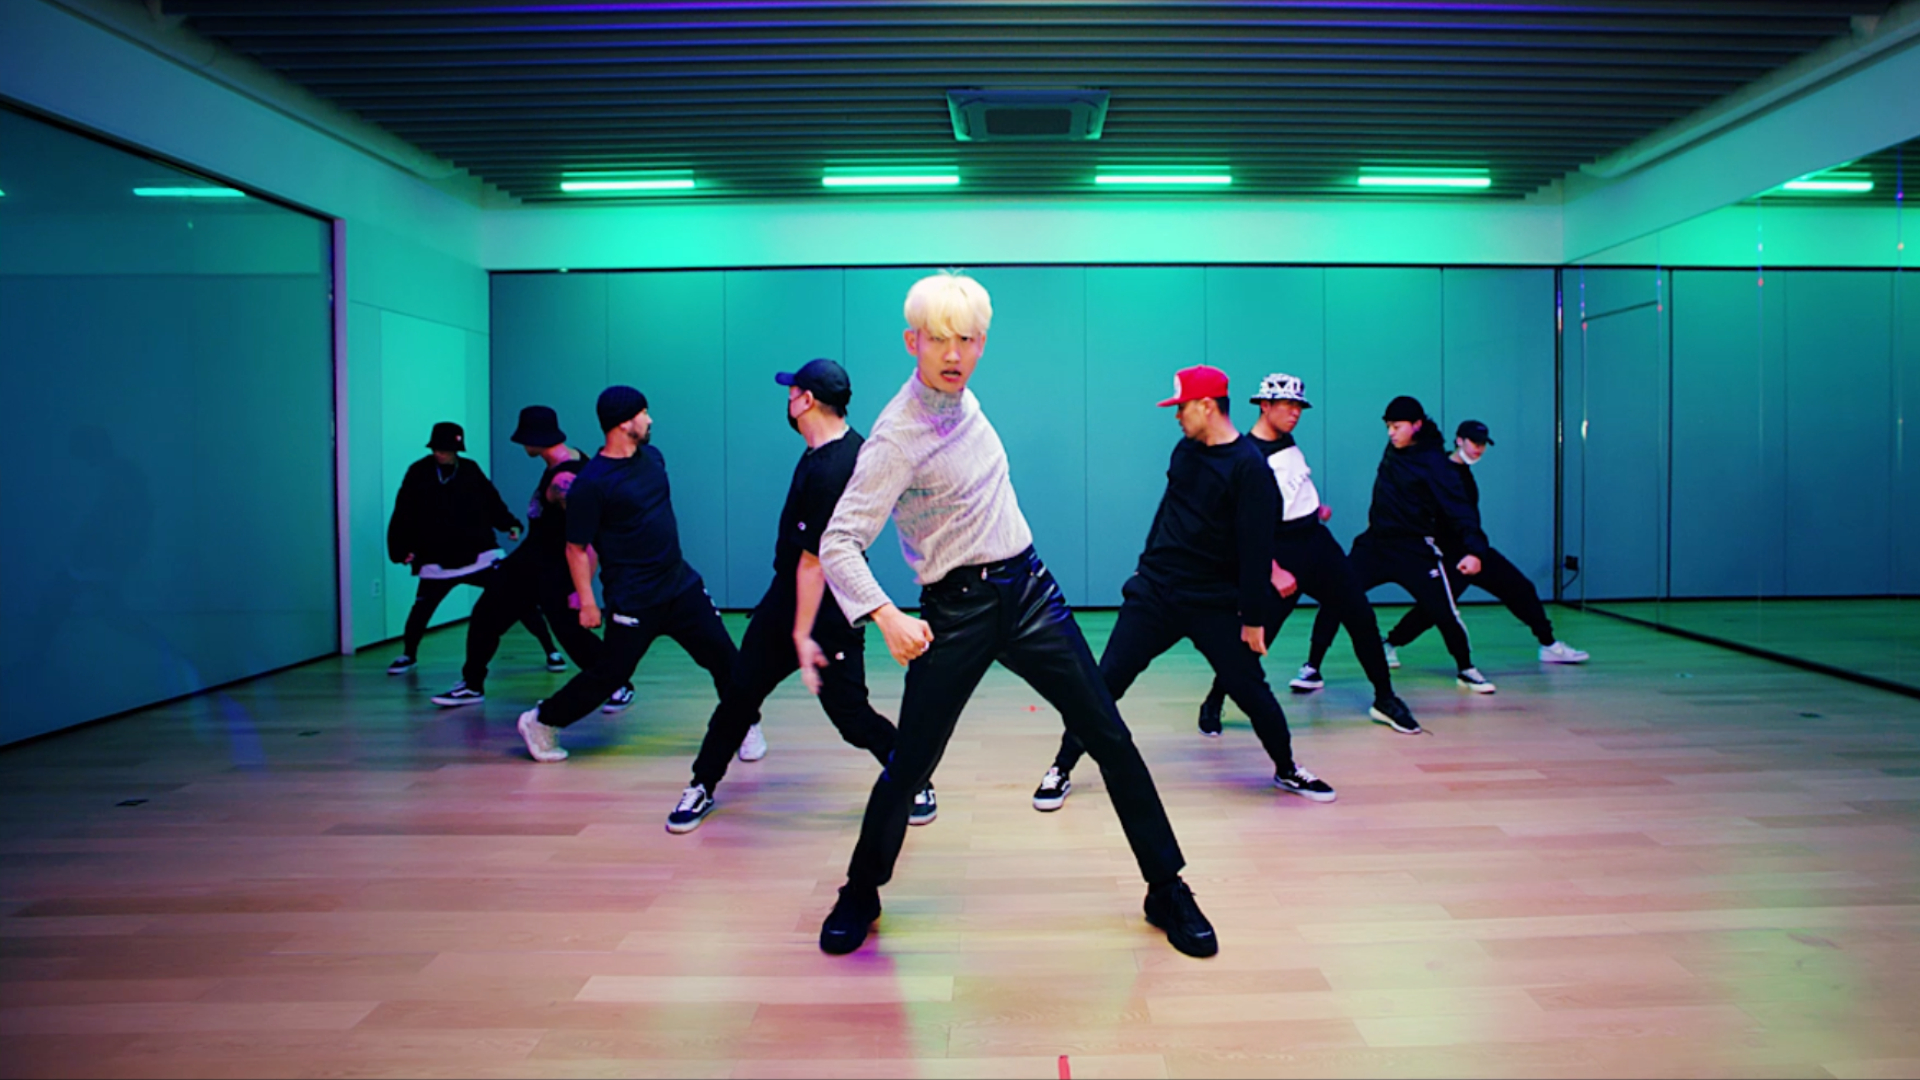 MAX 최강창민 'Chocolate' Dance Practice